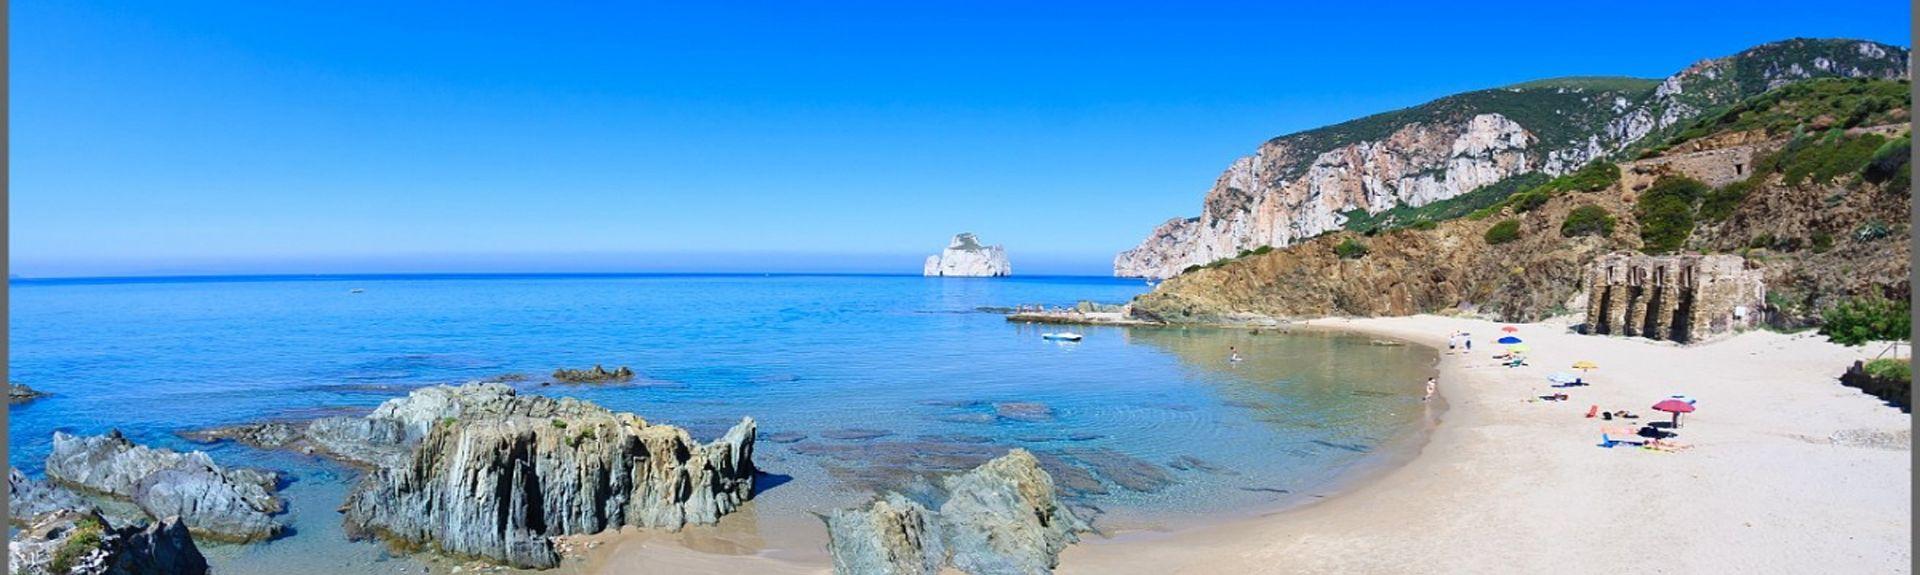 Carloforte, Sardinien, Italien